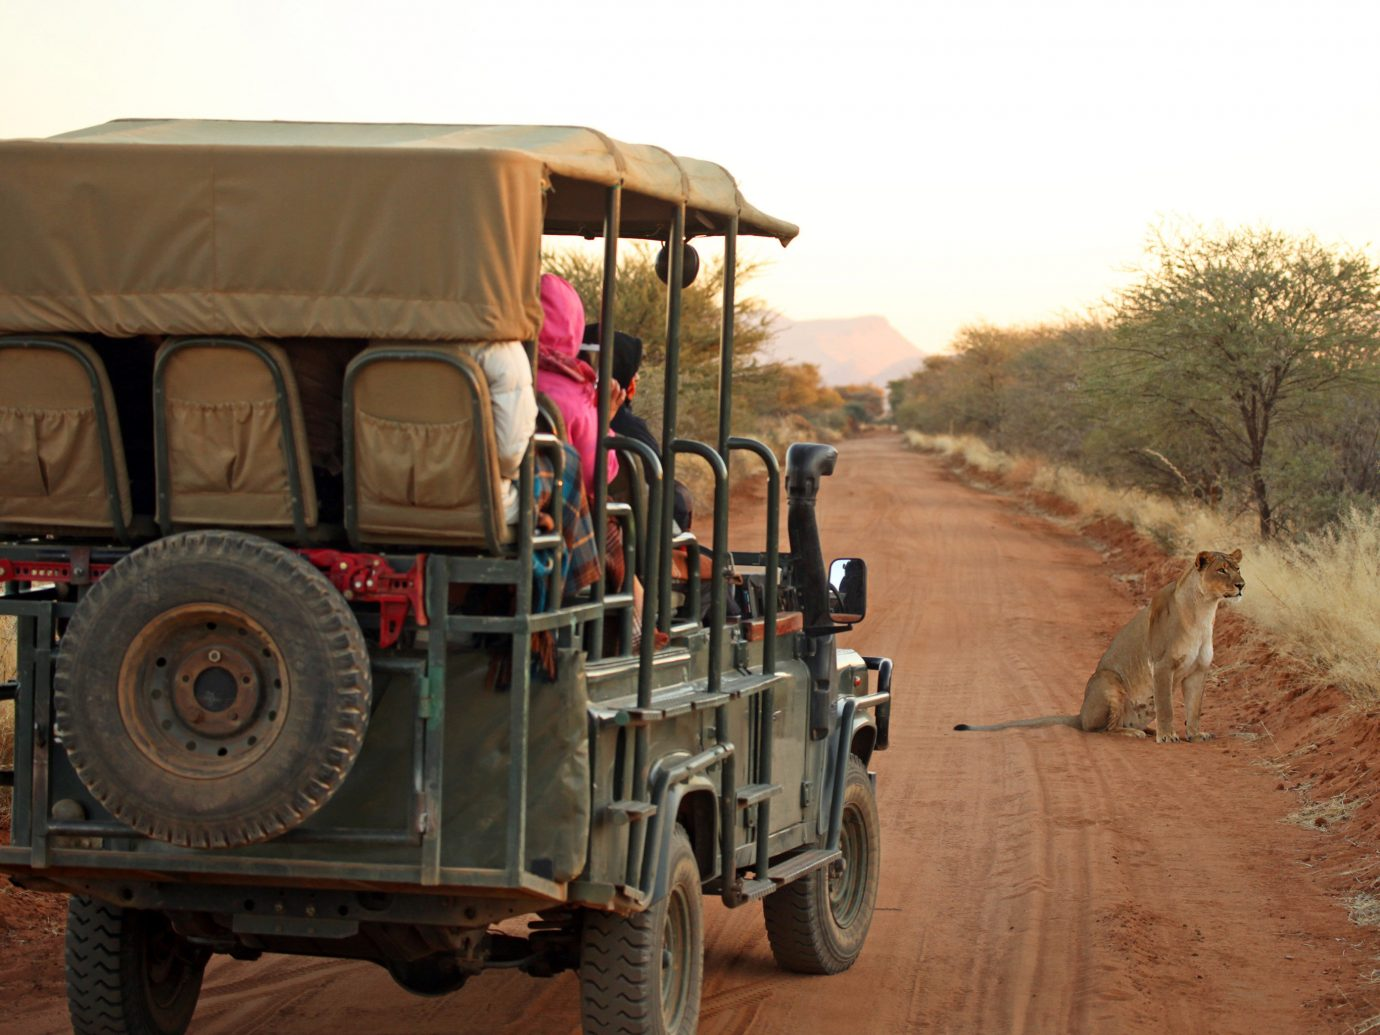 africa Honeymoon Namibia Romance Trip Ideas vehicle car motor vehicle transport Safari off roading mode of transport off road vehicle rural area soil jeep military vehicle landscape ecoregion vintage car commercial vehicle